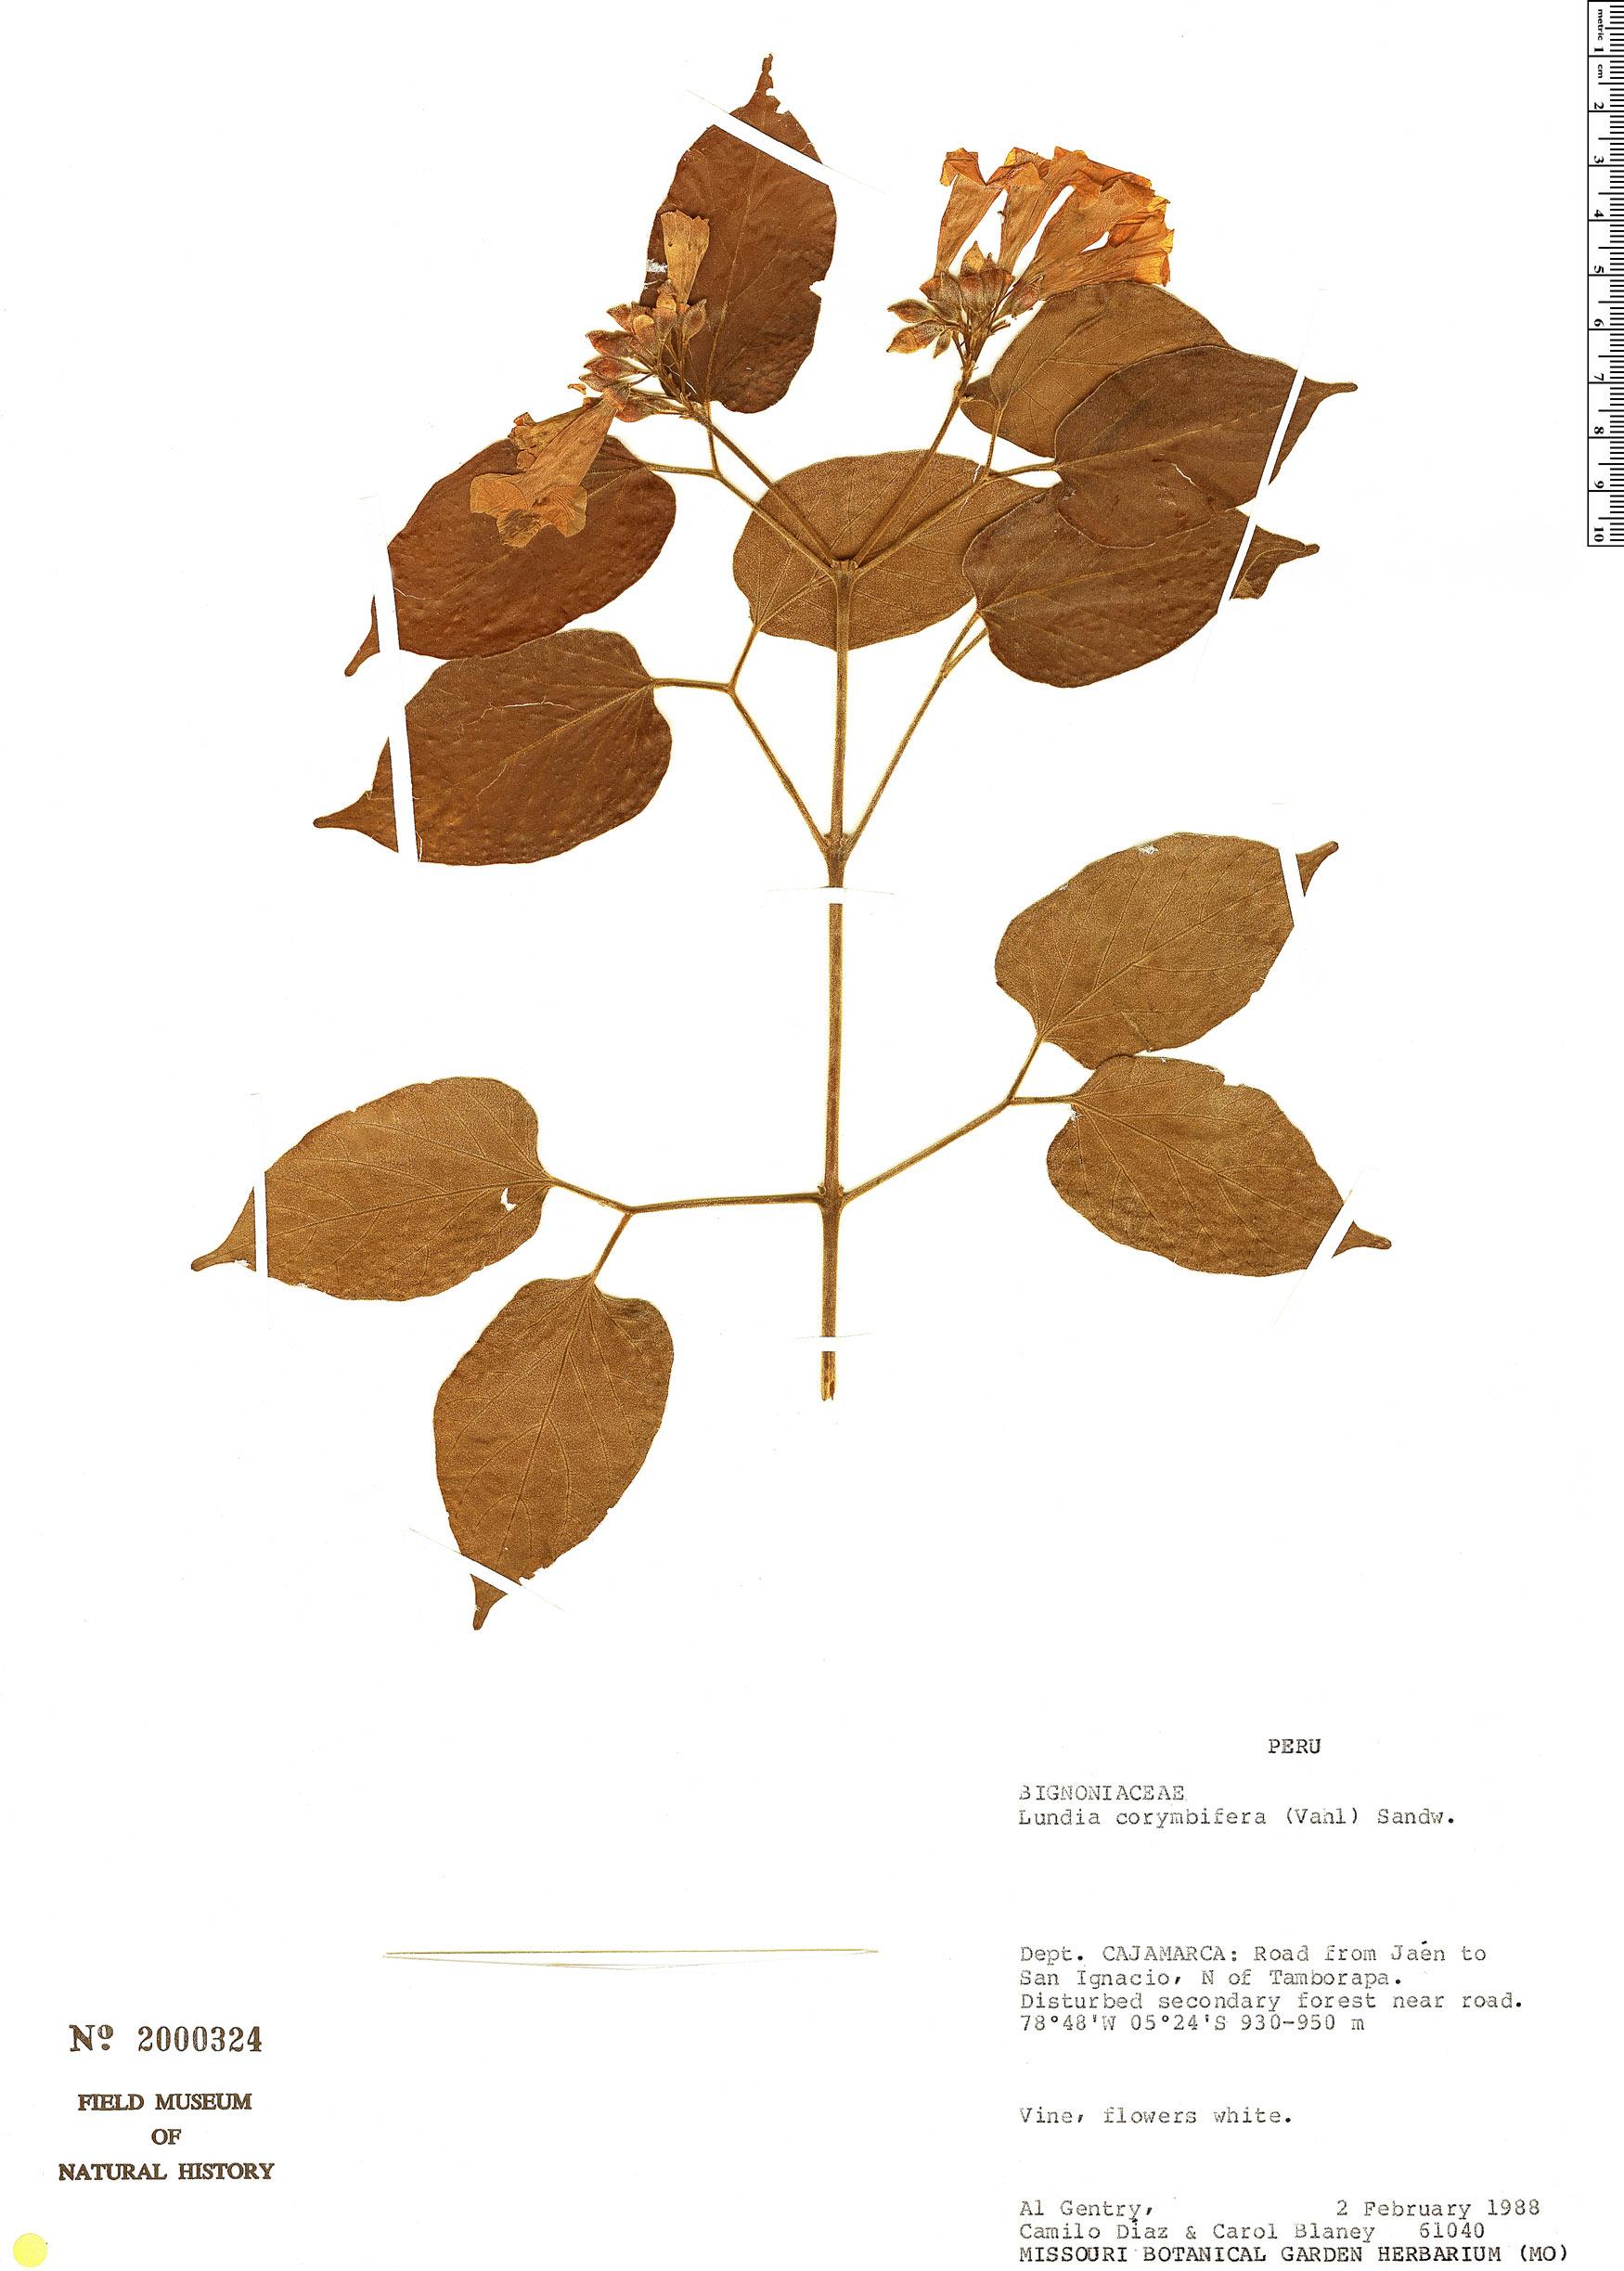 Specimen: Lundia corymbifera